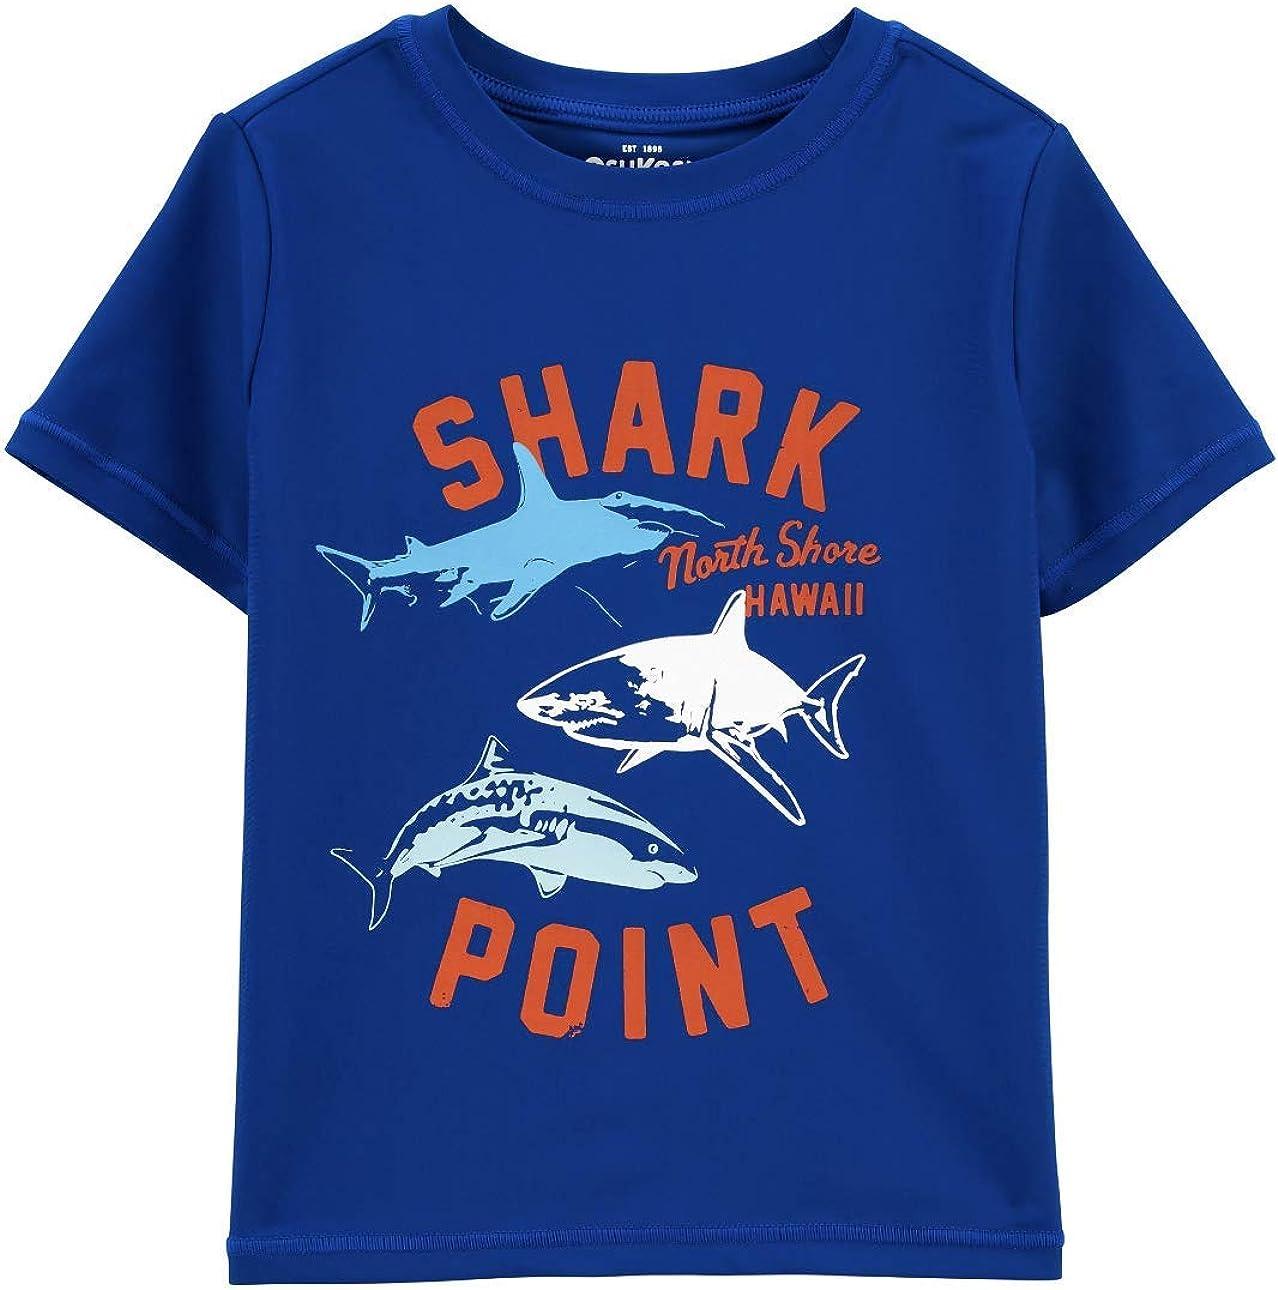 Carter's Our shop OFFers the best service Shark Luxury Point Rash Swim Guard Shirt